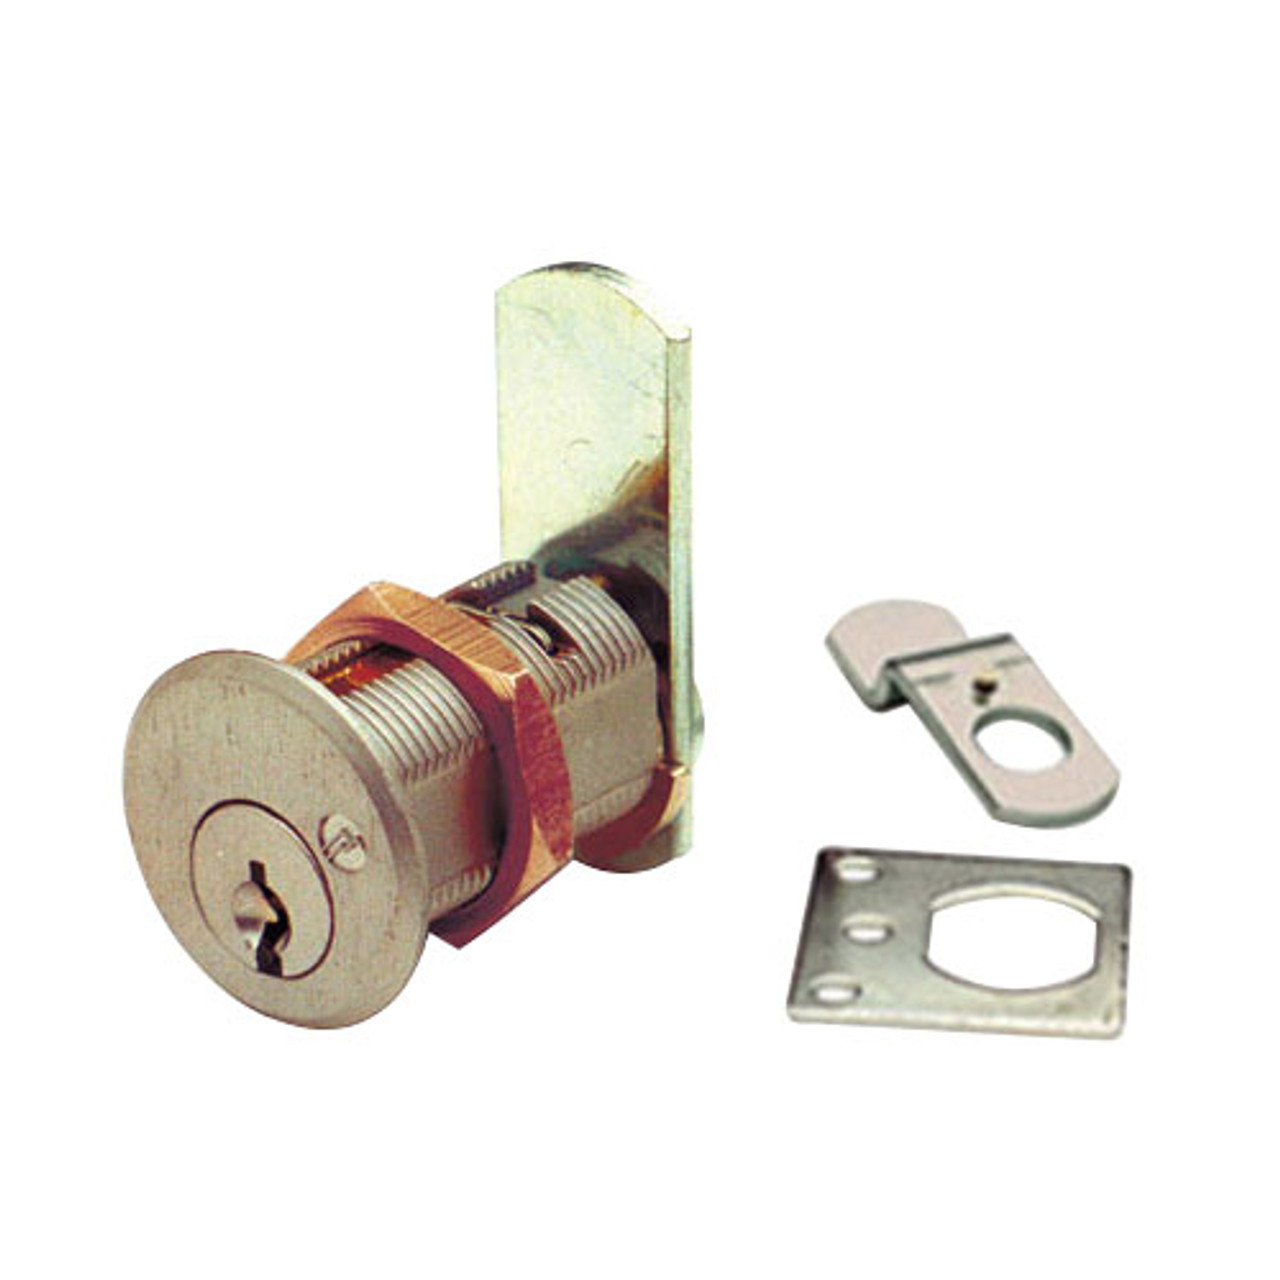 Olympus DCN2-KA101-US3 Cam Locks in Bright Brass Finish